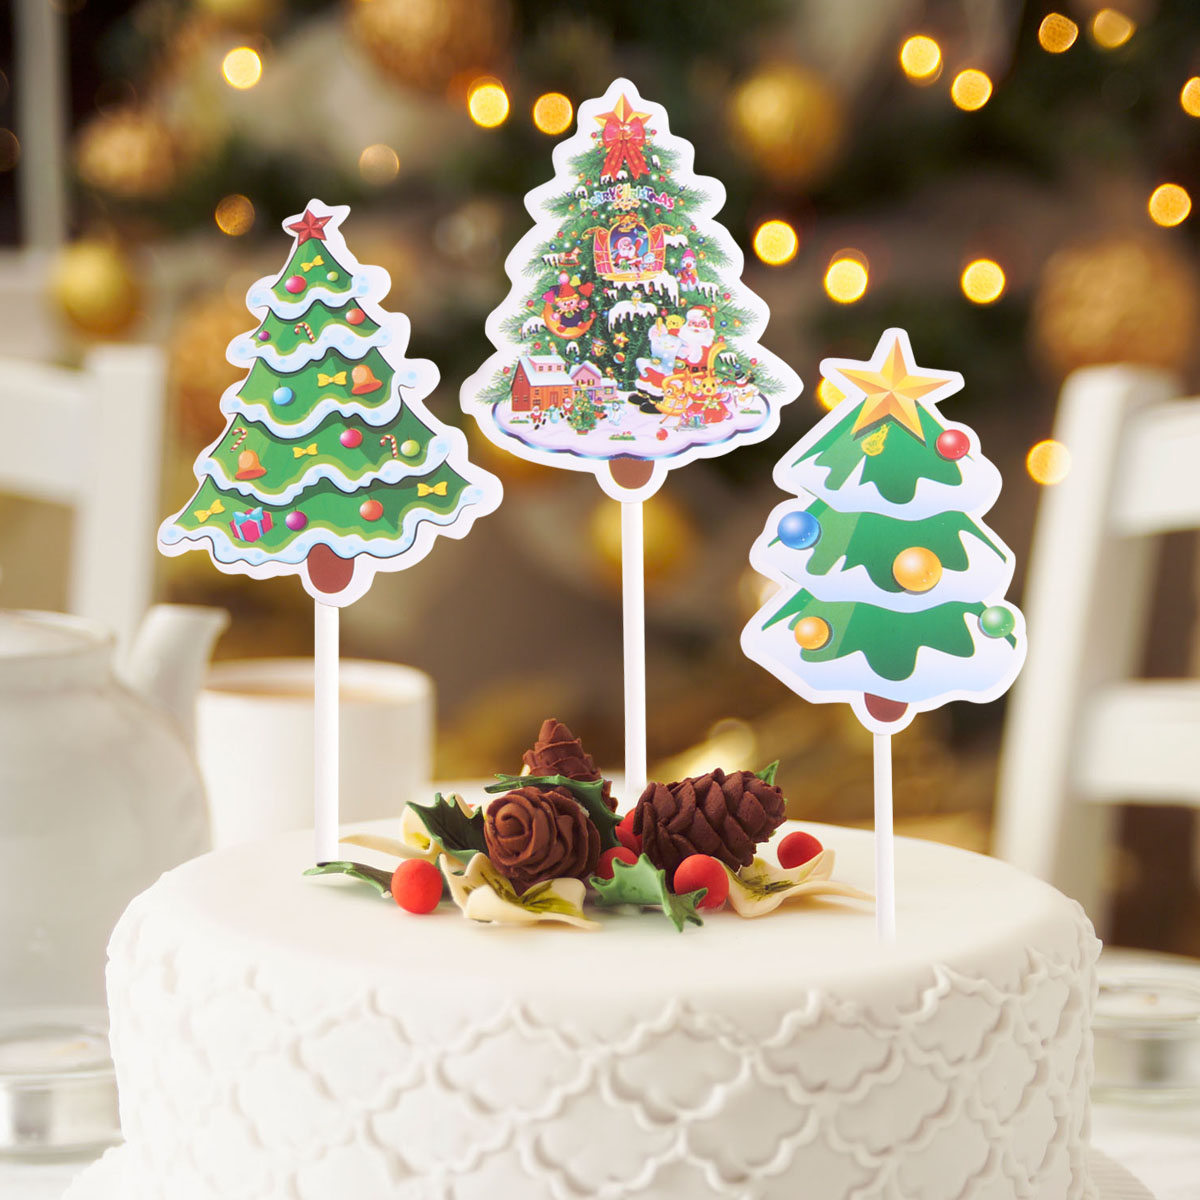 Cupcake Toppers 10pcs Cake Paper Christmas Tree Cake ...